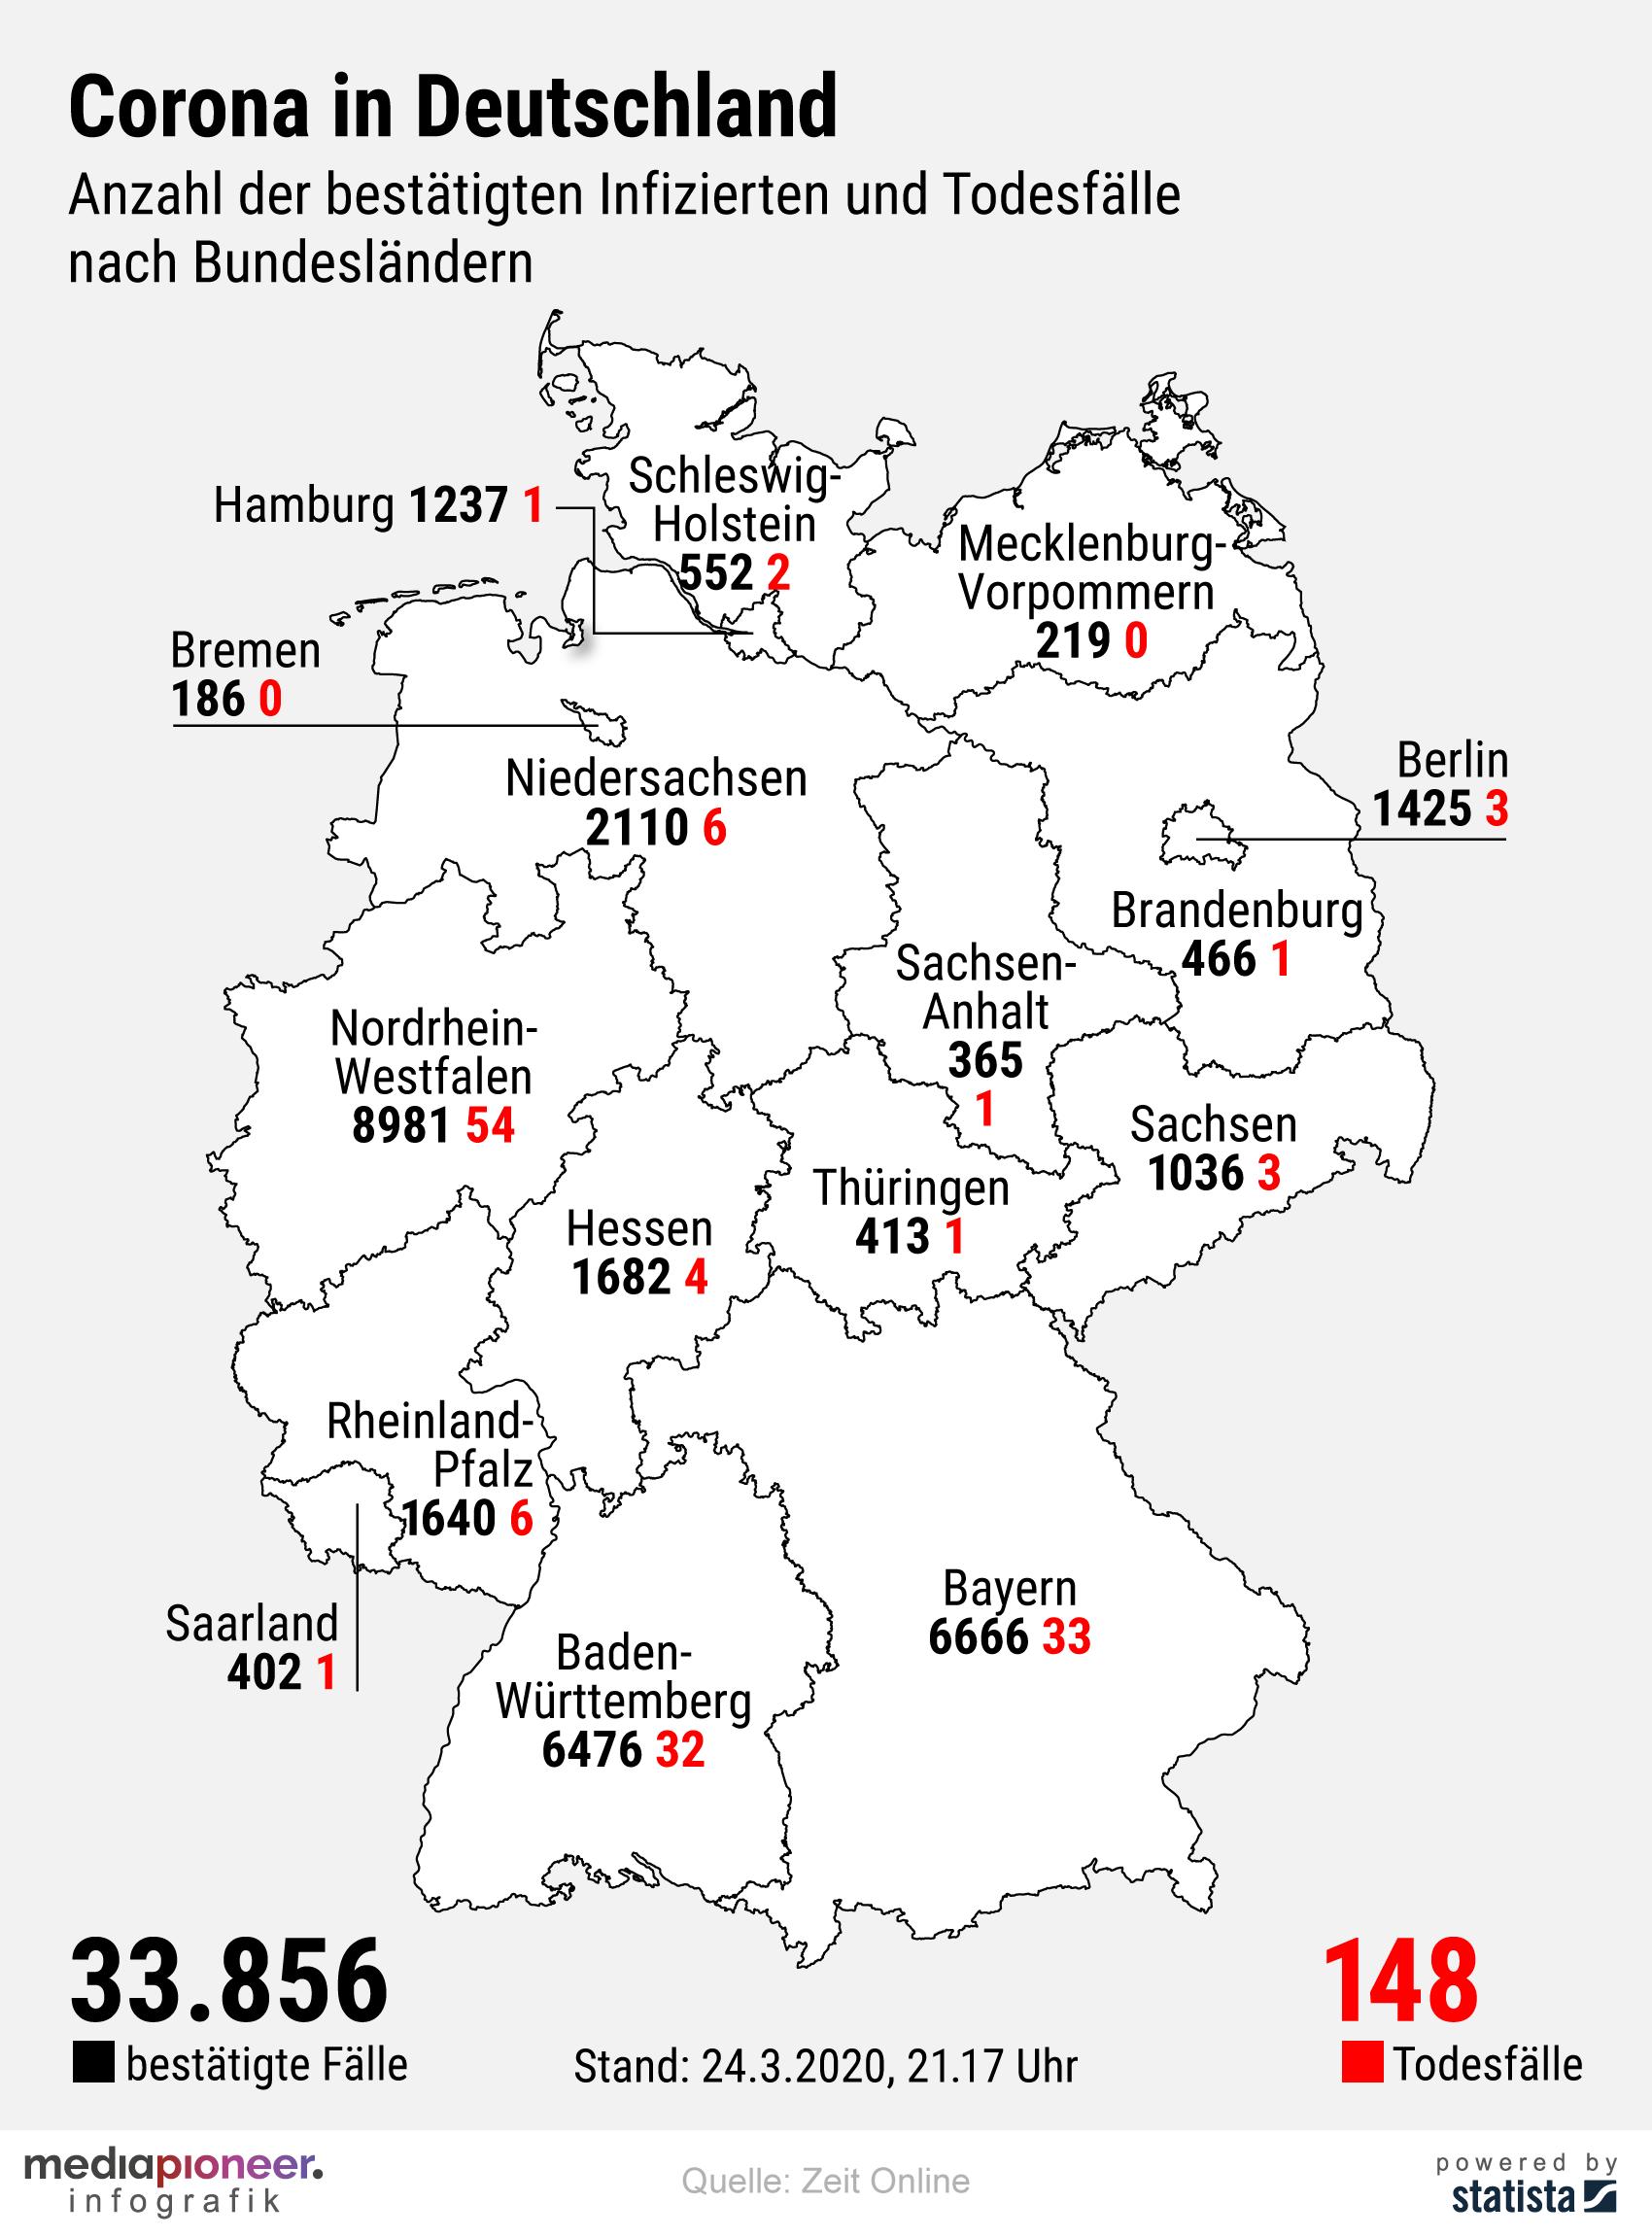 200325-infografik-media-pioneer-Corona-Bundeslaender